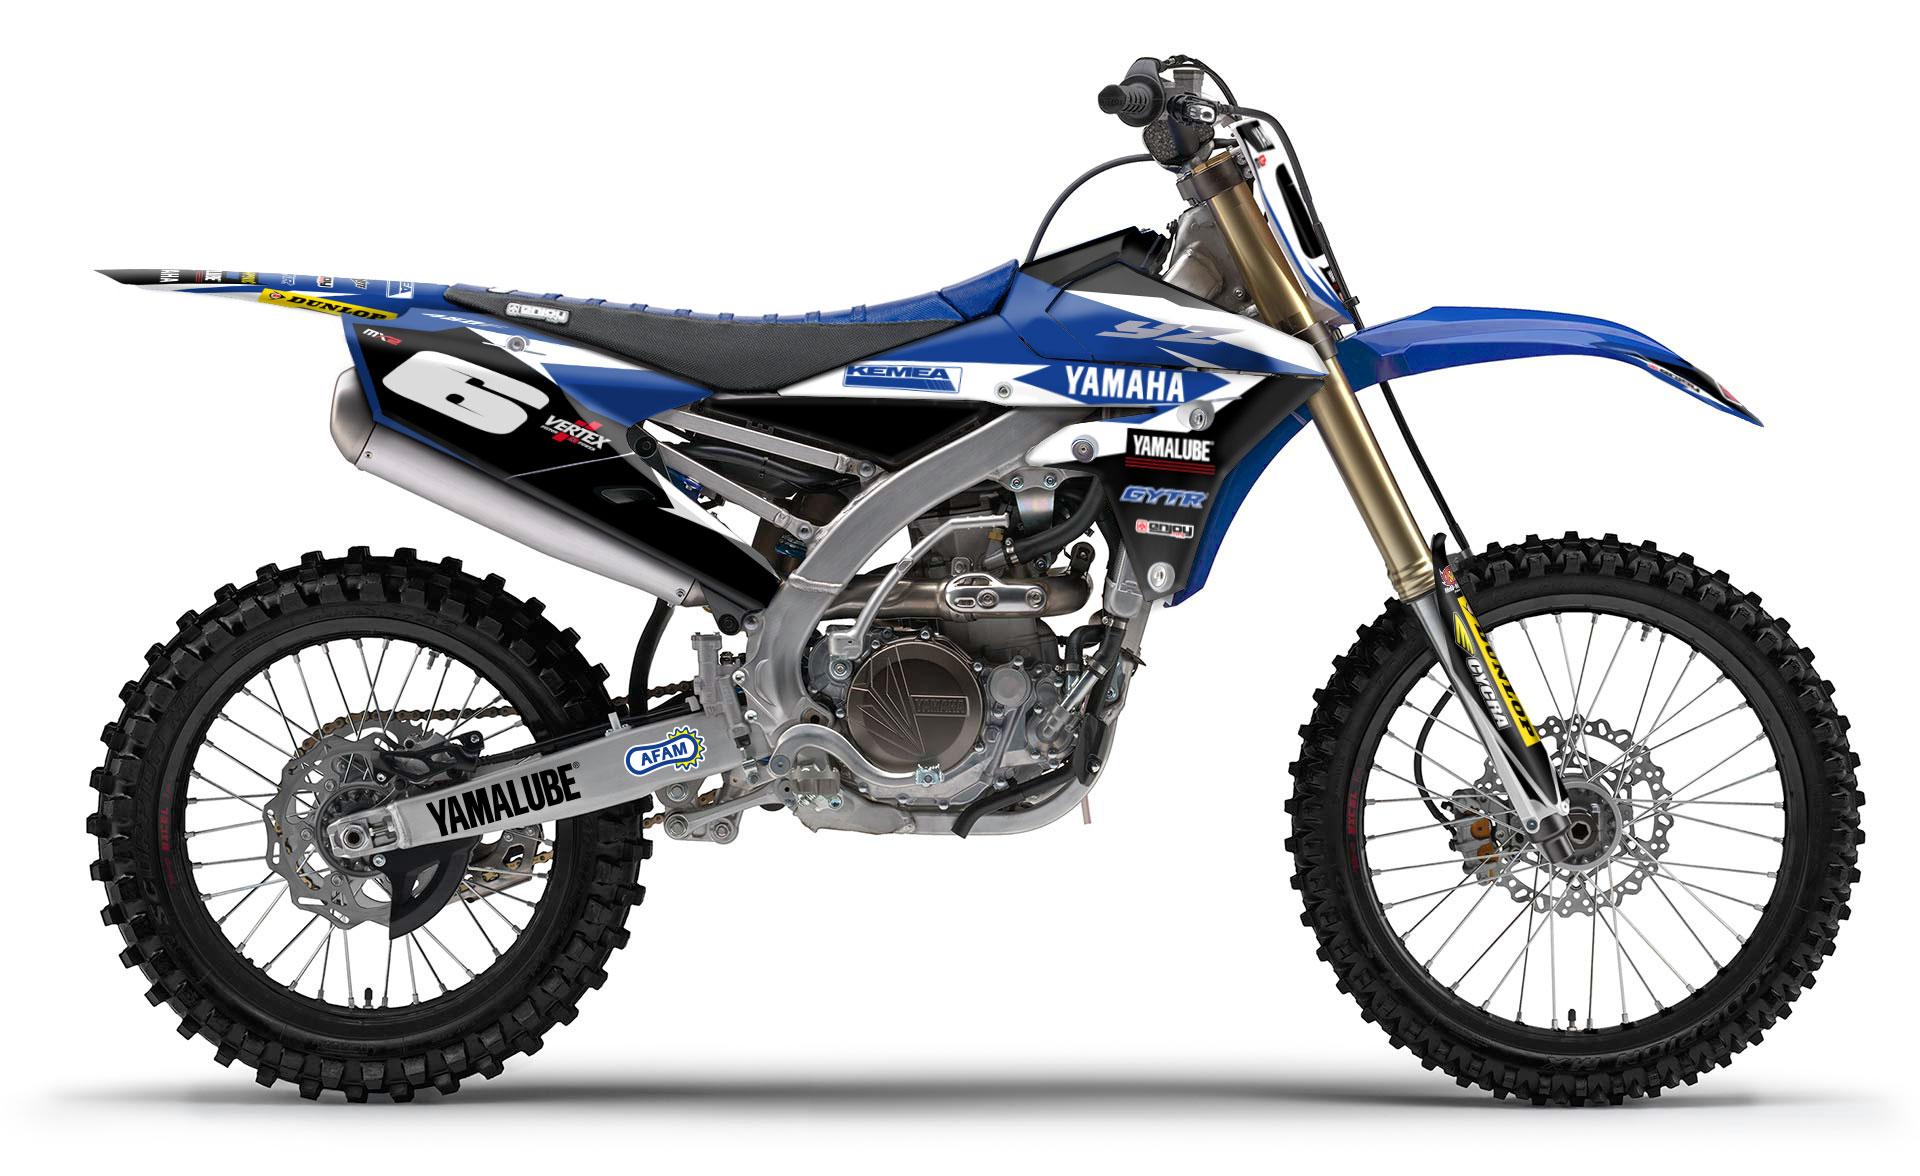 ENJOY MFG Yamaha Kemea チームデカールフルキット+シートカバー